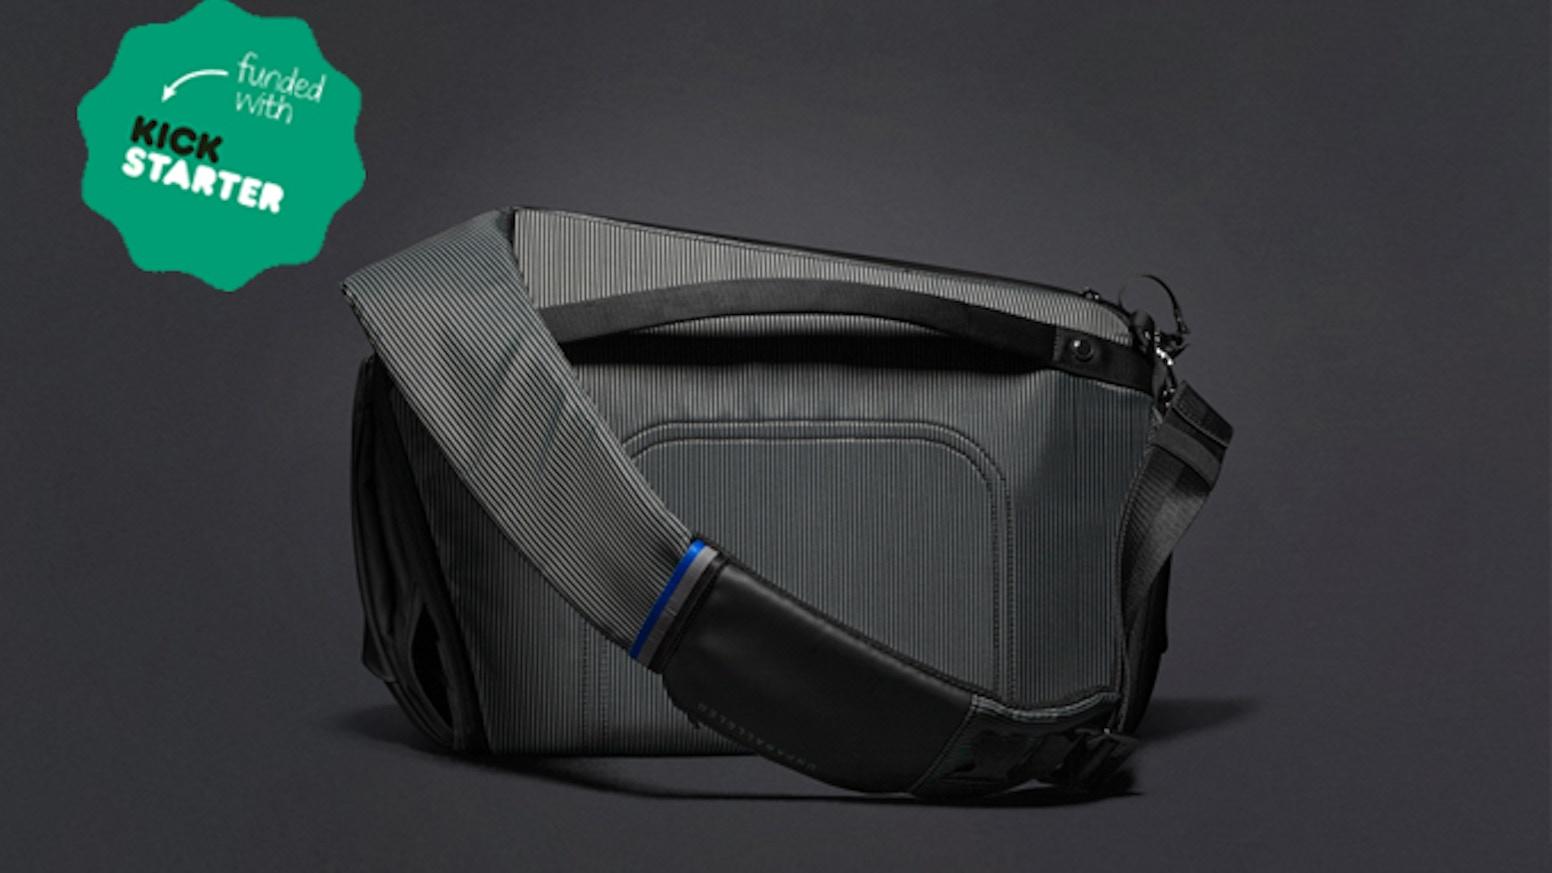 Sleek as a sling, spacious as a backpack. The best urban bag, period.